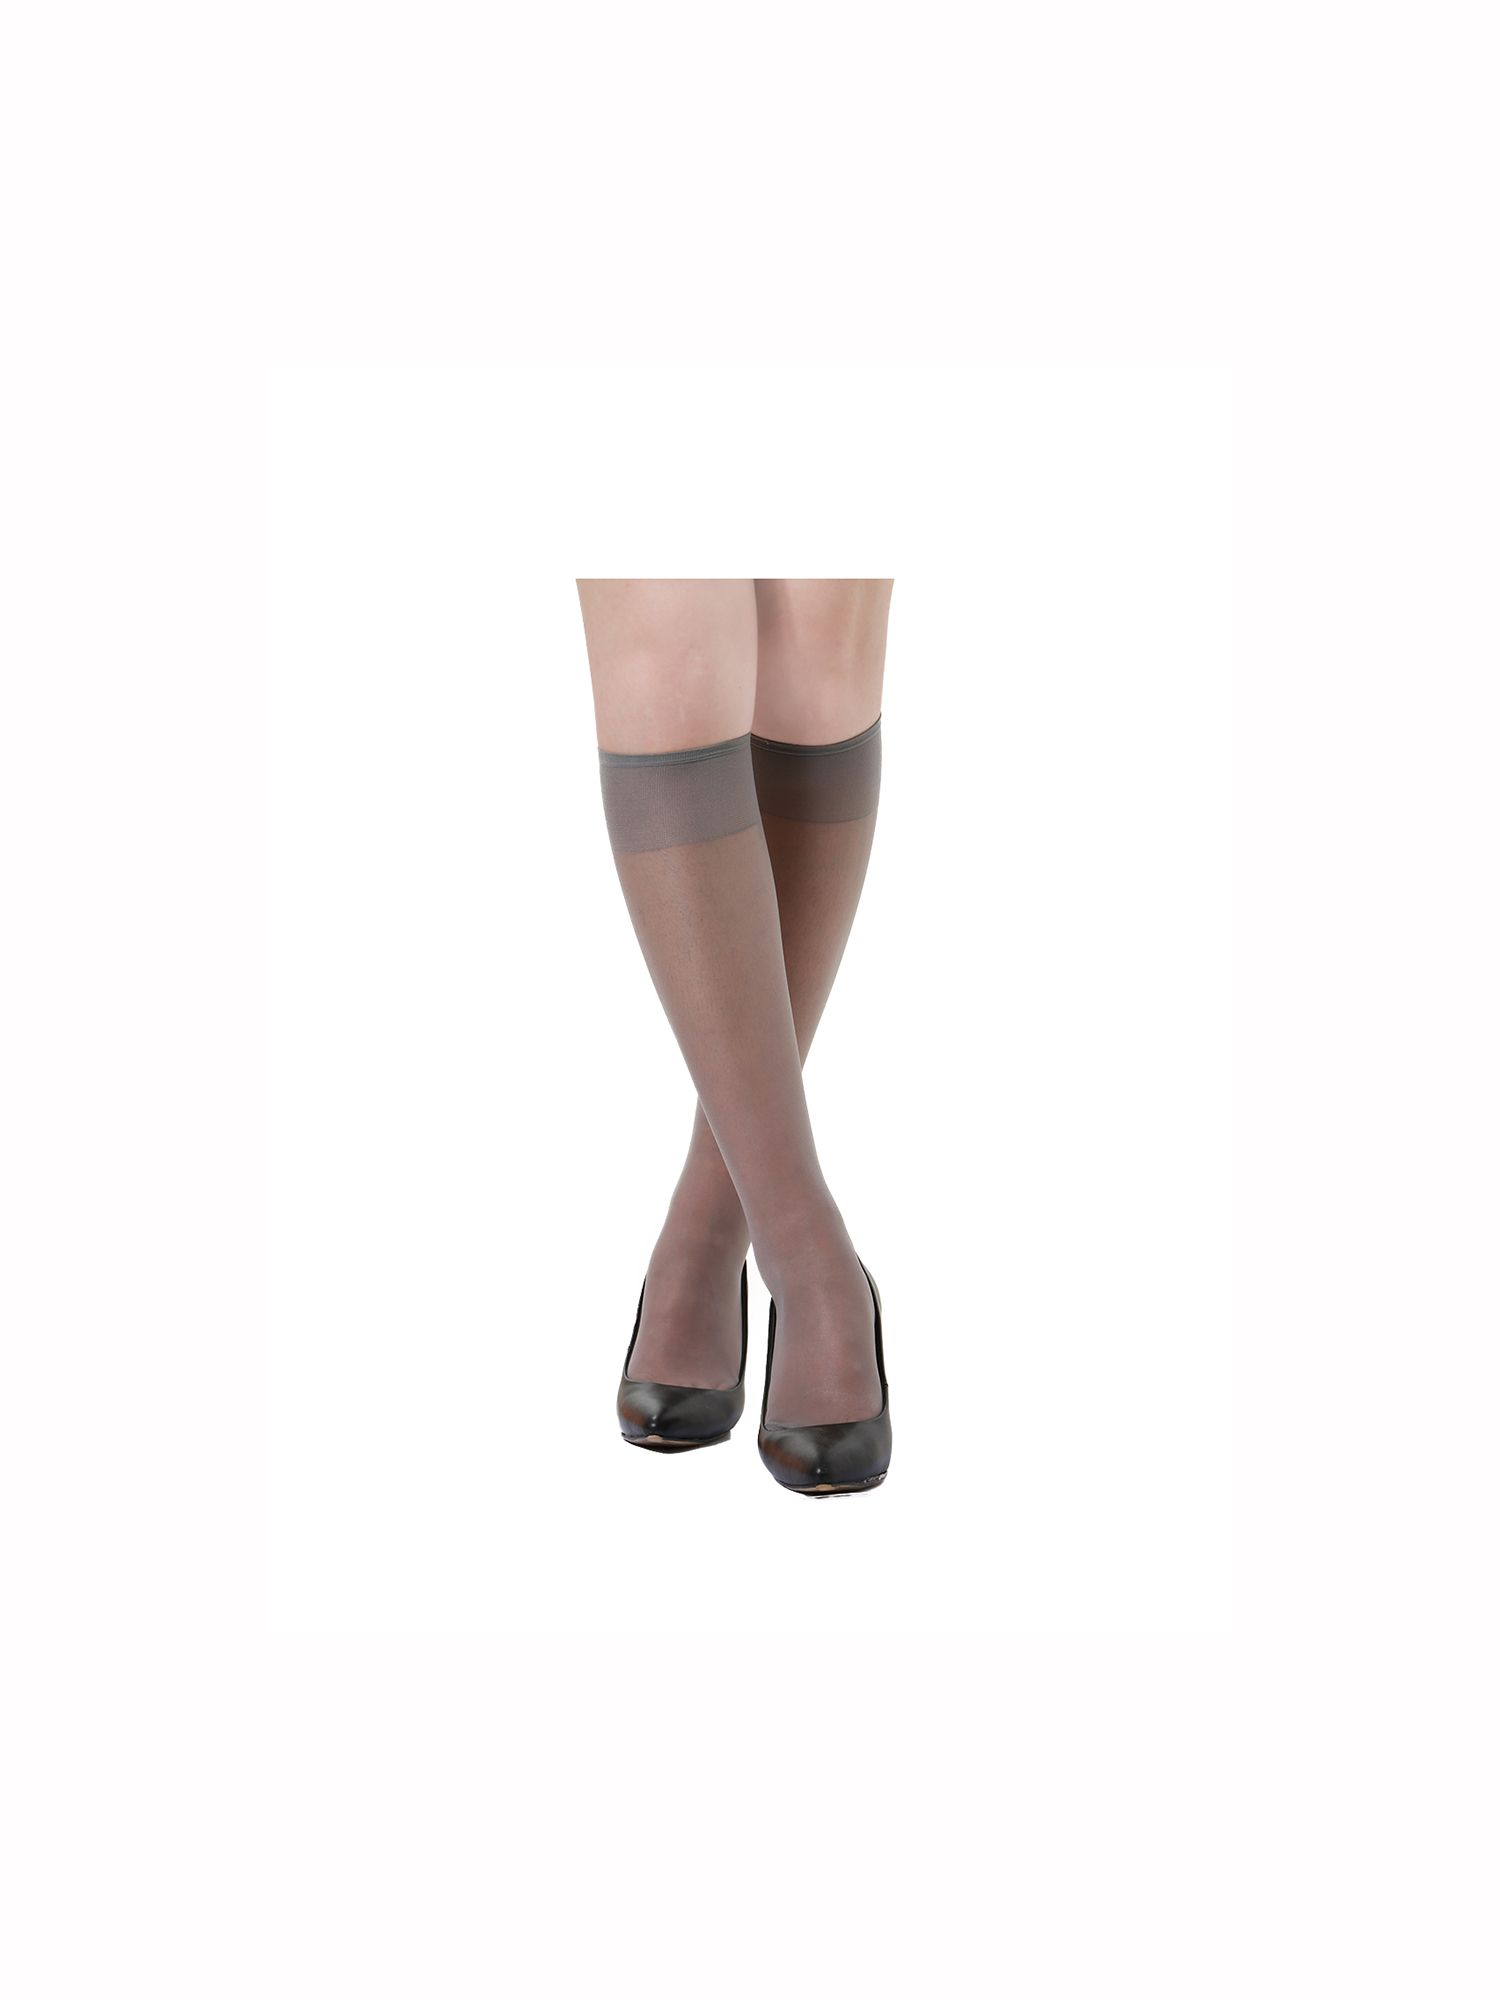 11c70ea1d08143 Unique Bargains Women's Knee High Silky Reinforced Toe Sheer Socks  Stockings 10 Pack#Knee, #High, #Silky